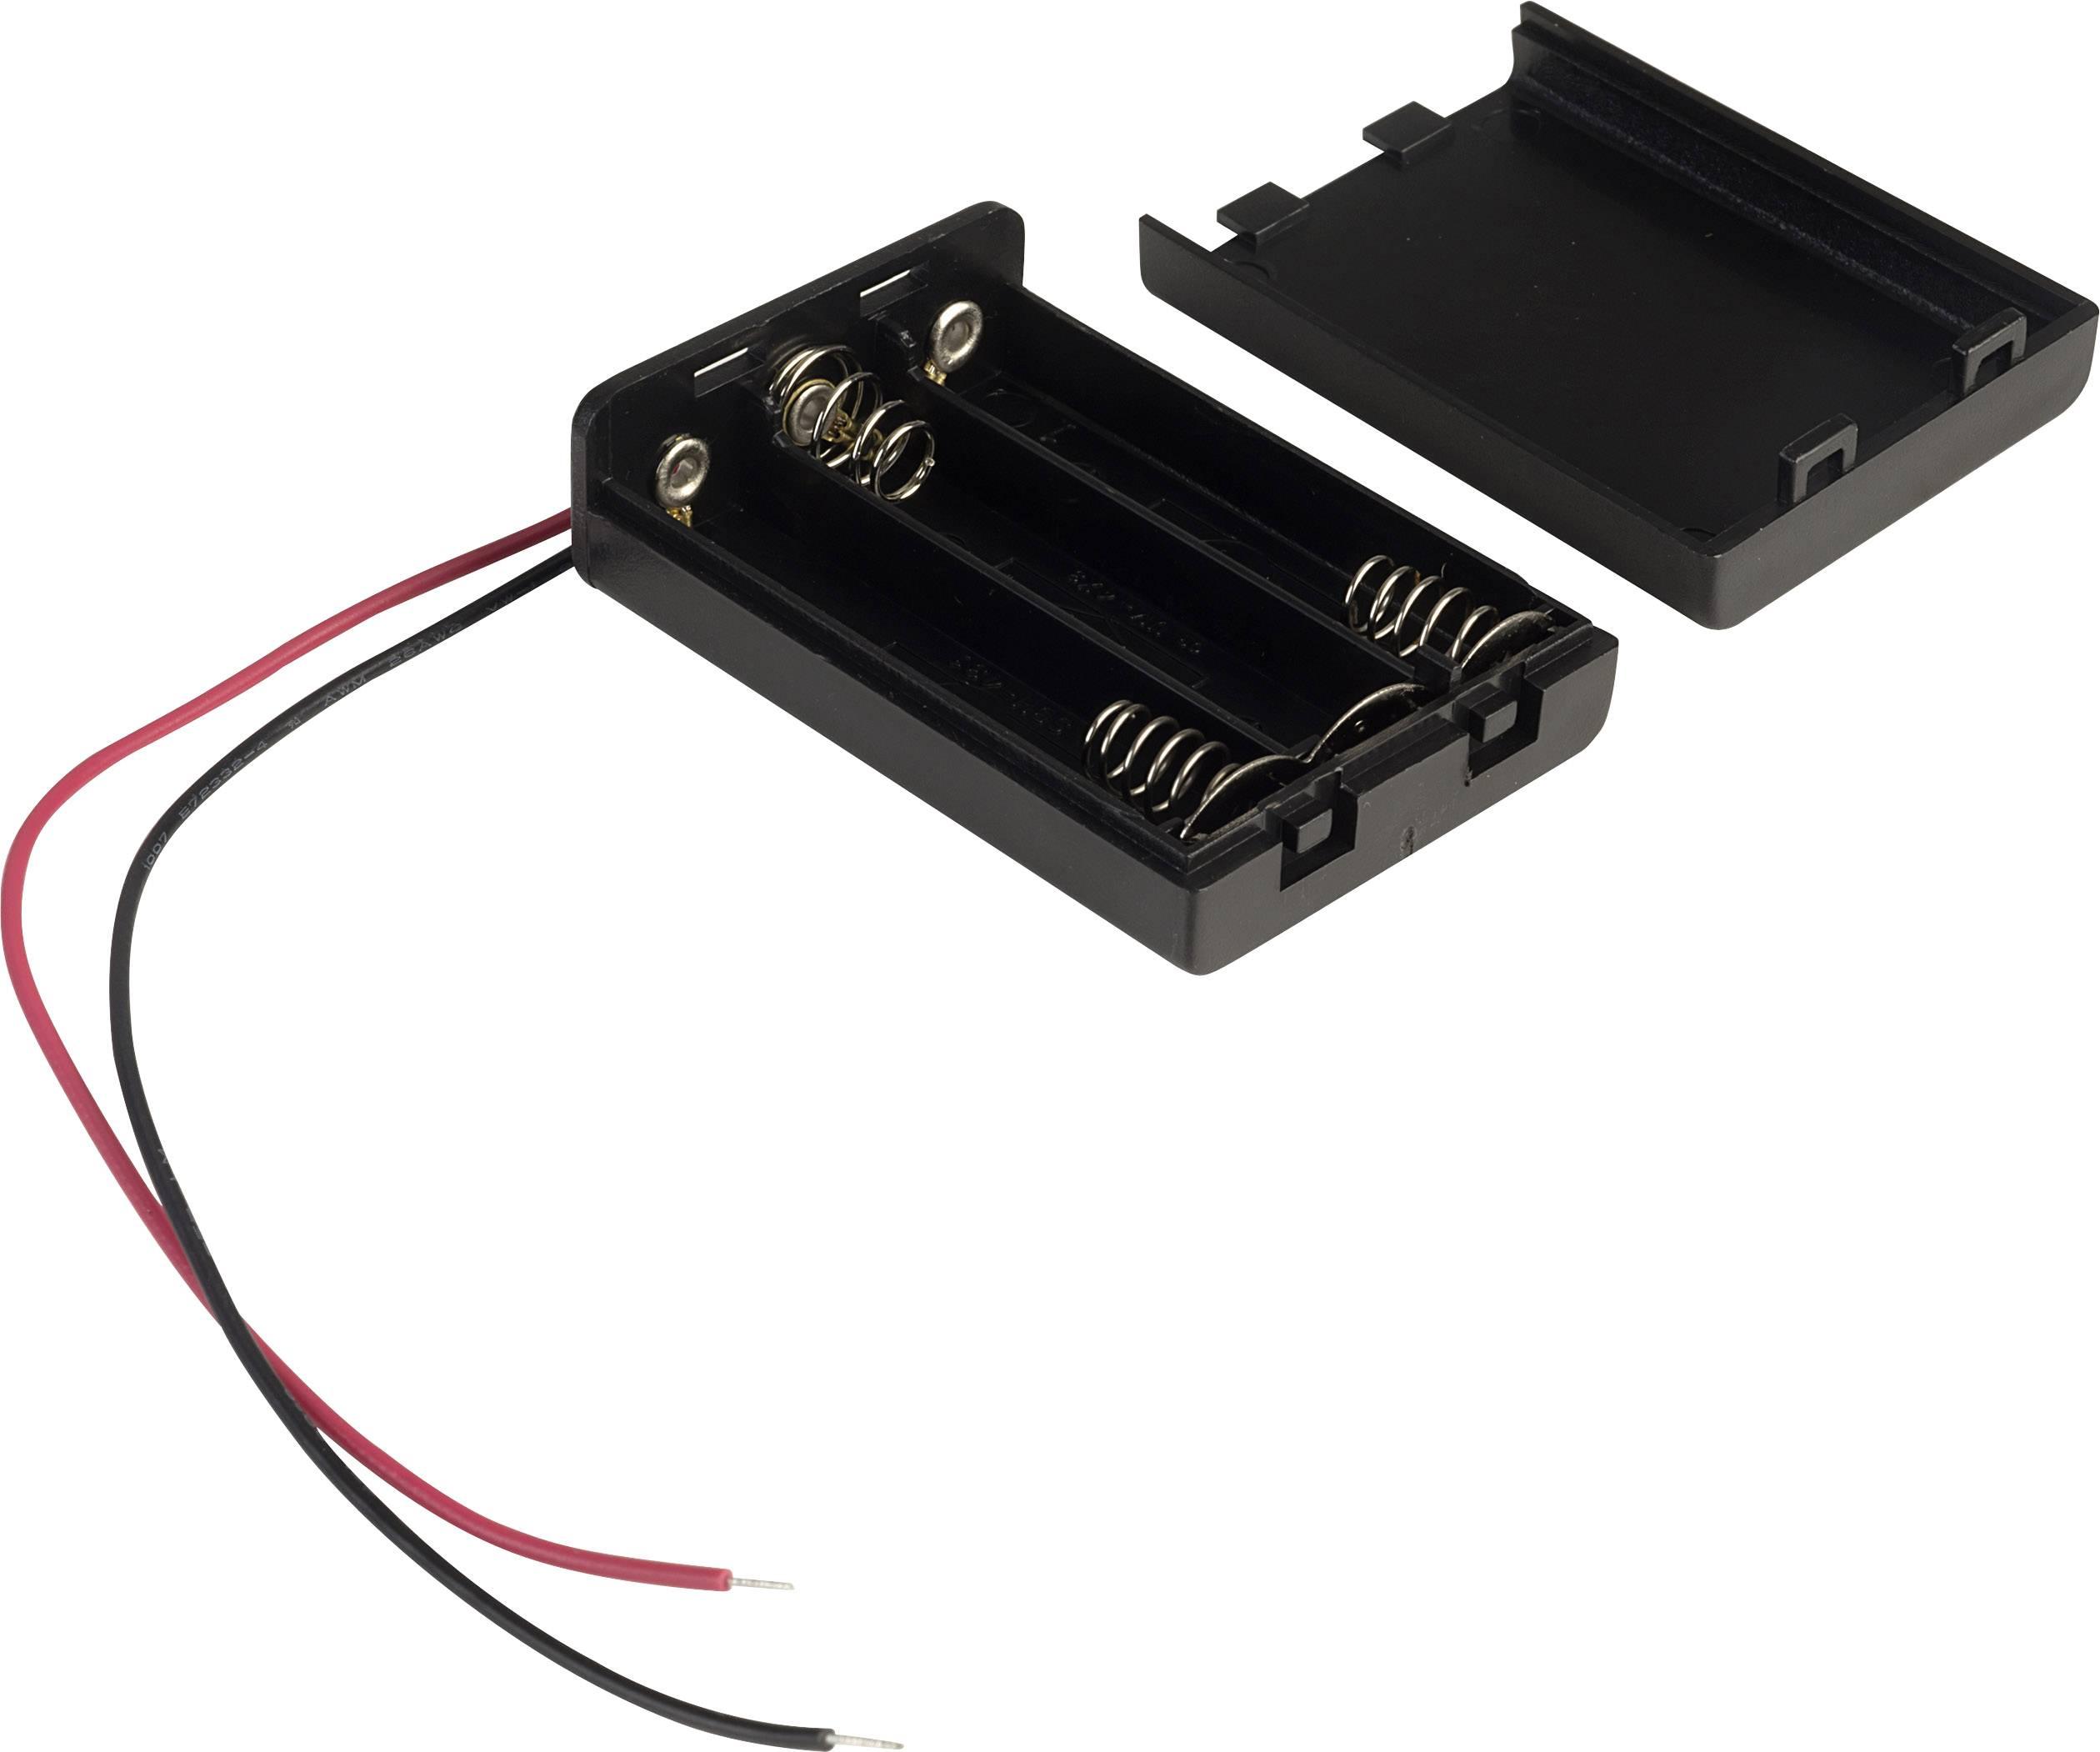 4x Micro Batterie Batteriefach /_ Batteriehalter mit Anschlusskabel 4x AAA